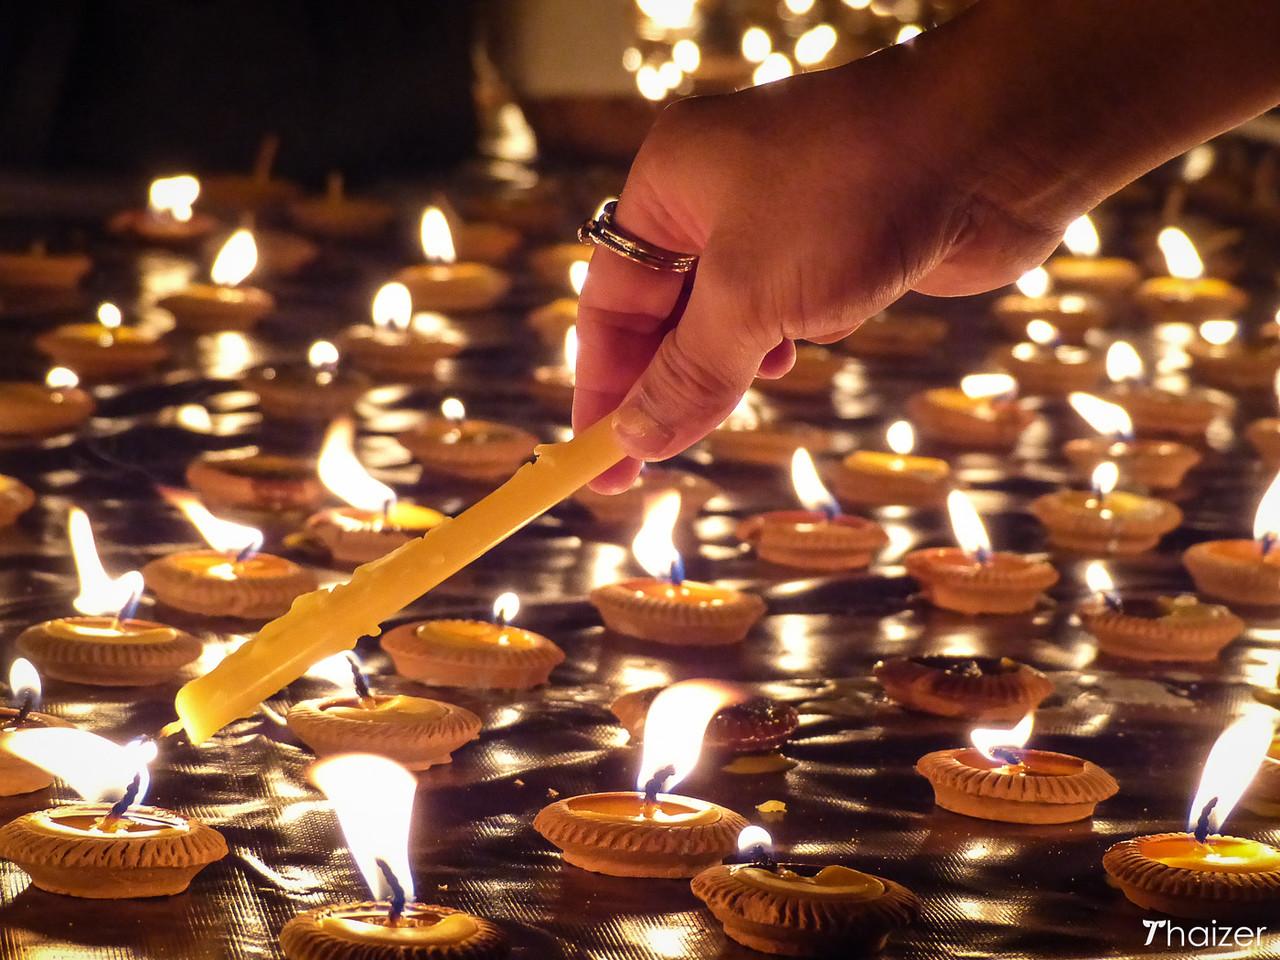 Chiang Mai candles